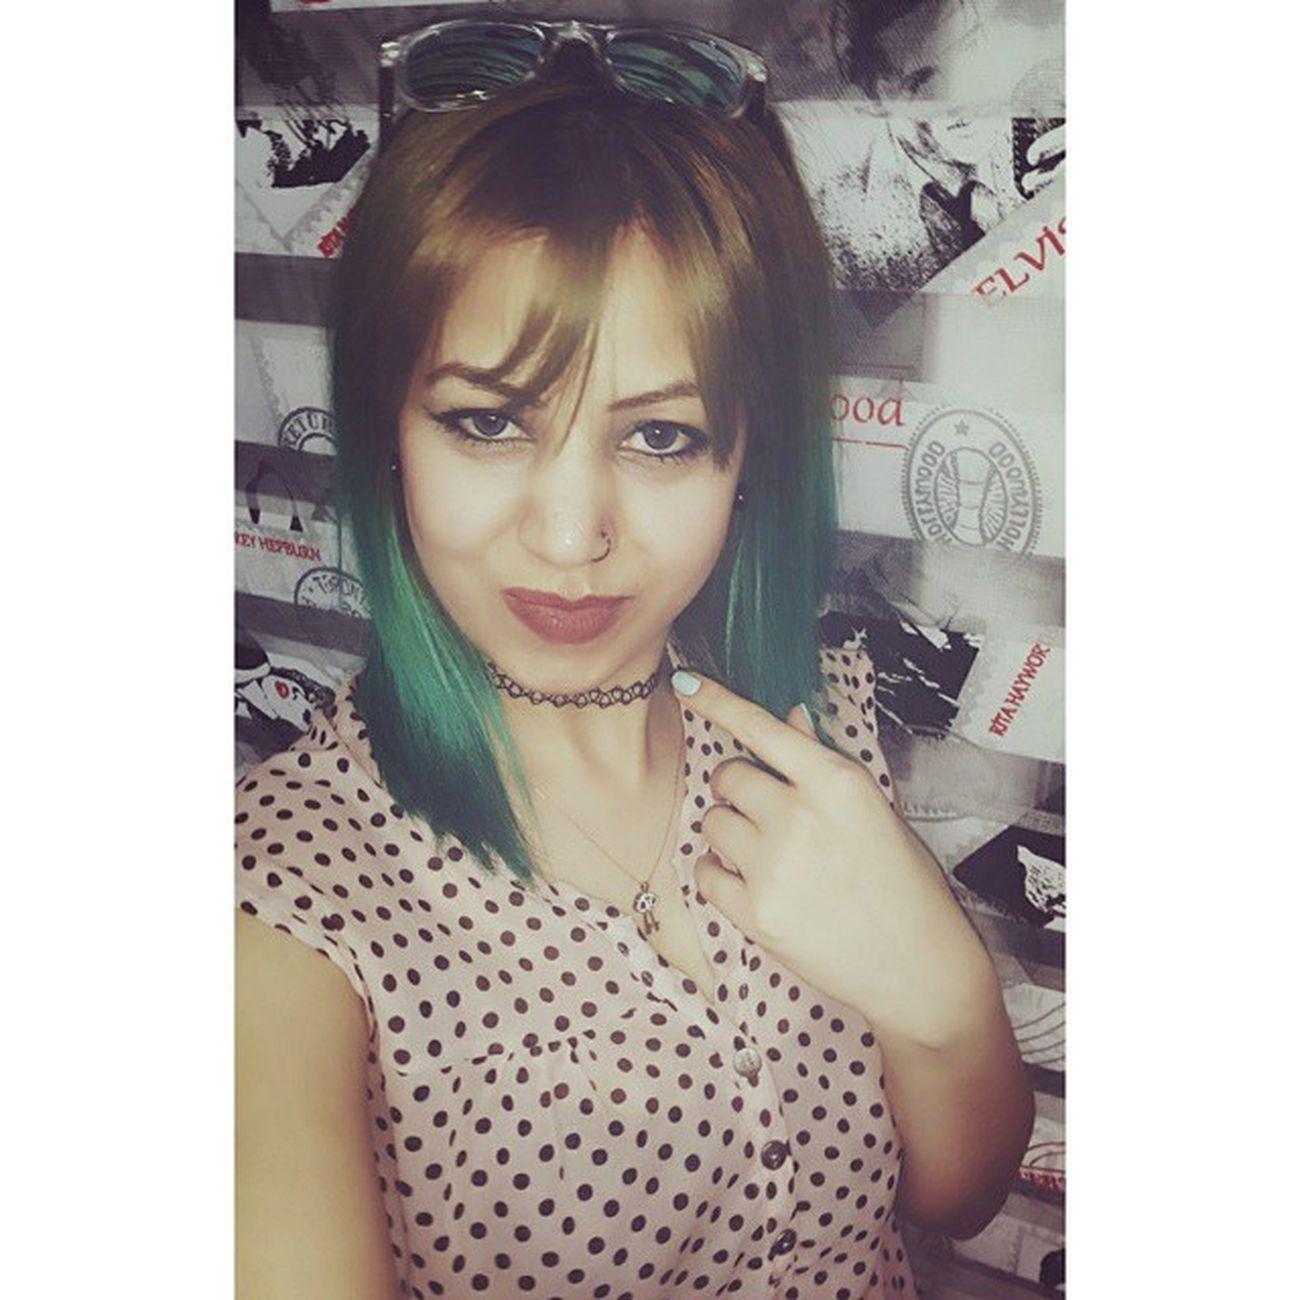 Herşey Güzel Olması Dileğiyle.. 🙏🙆❤💋💋👍 Beauty Cute Greenhair Grily bestoftheday amazing likesforlikes